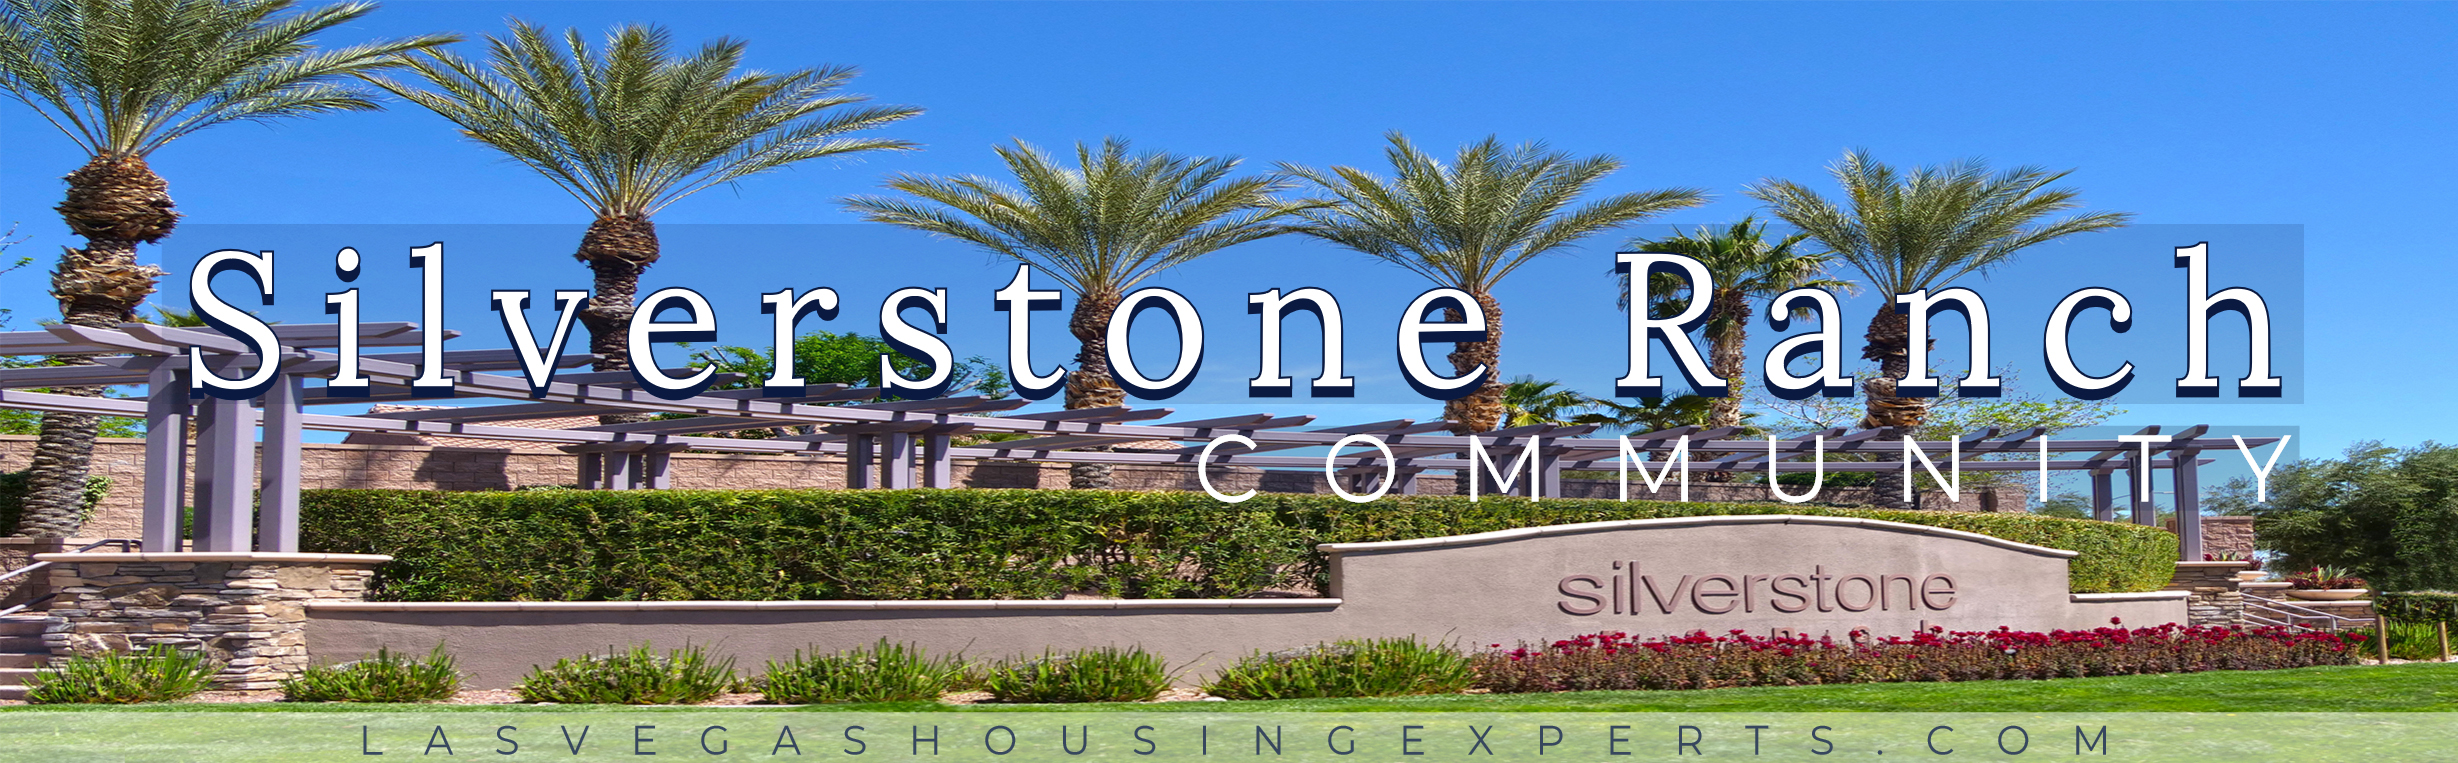 Silverstone Ranch Las Vegas Housing Experts real estate